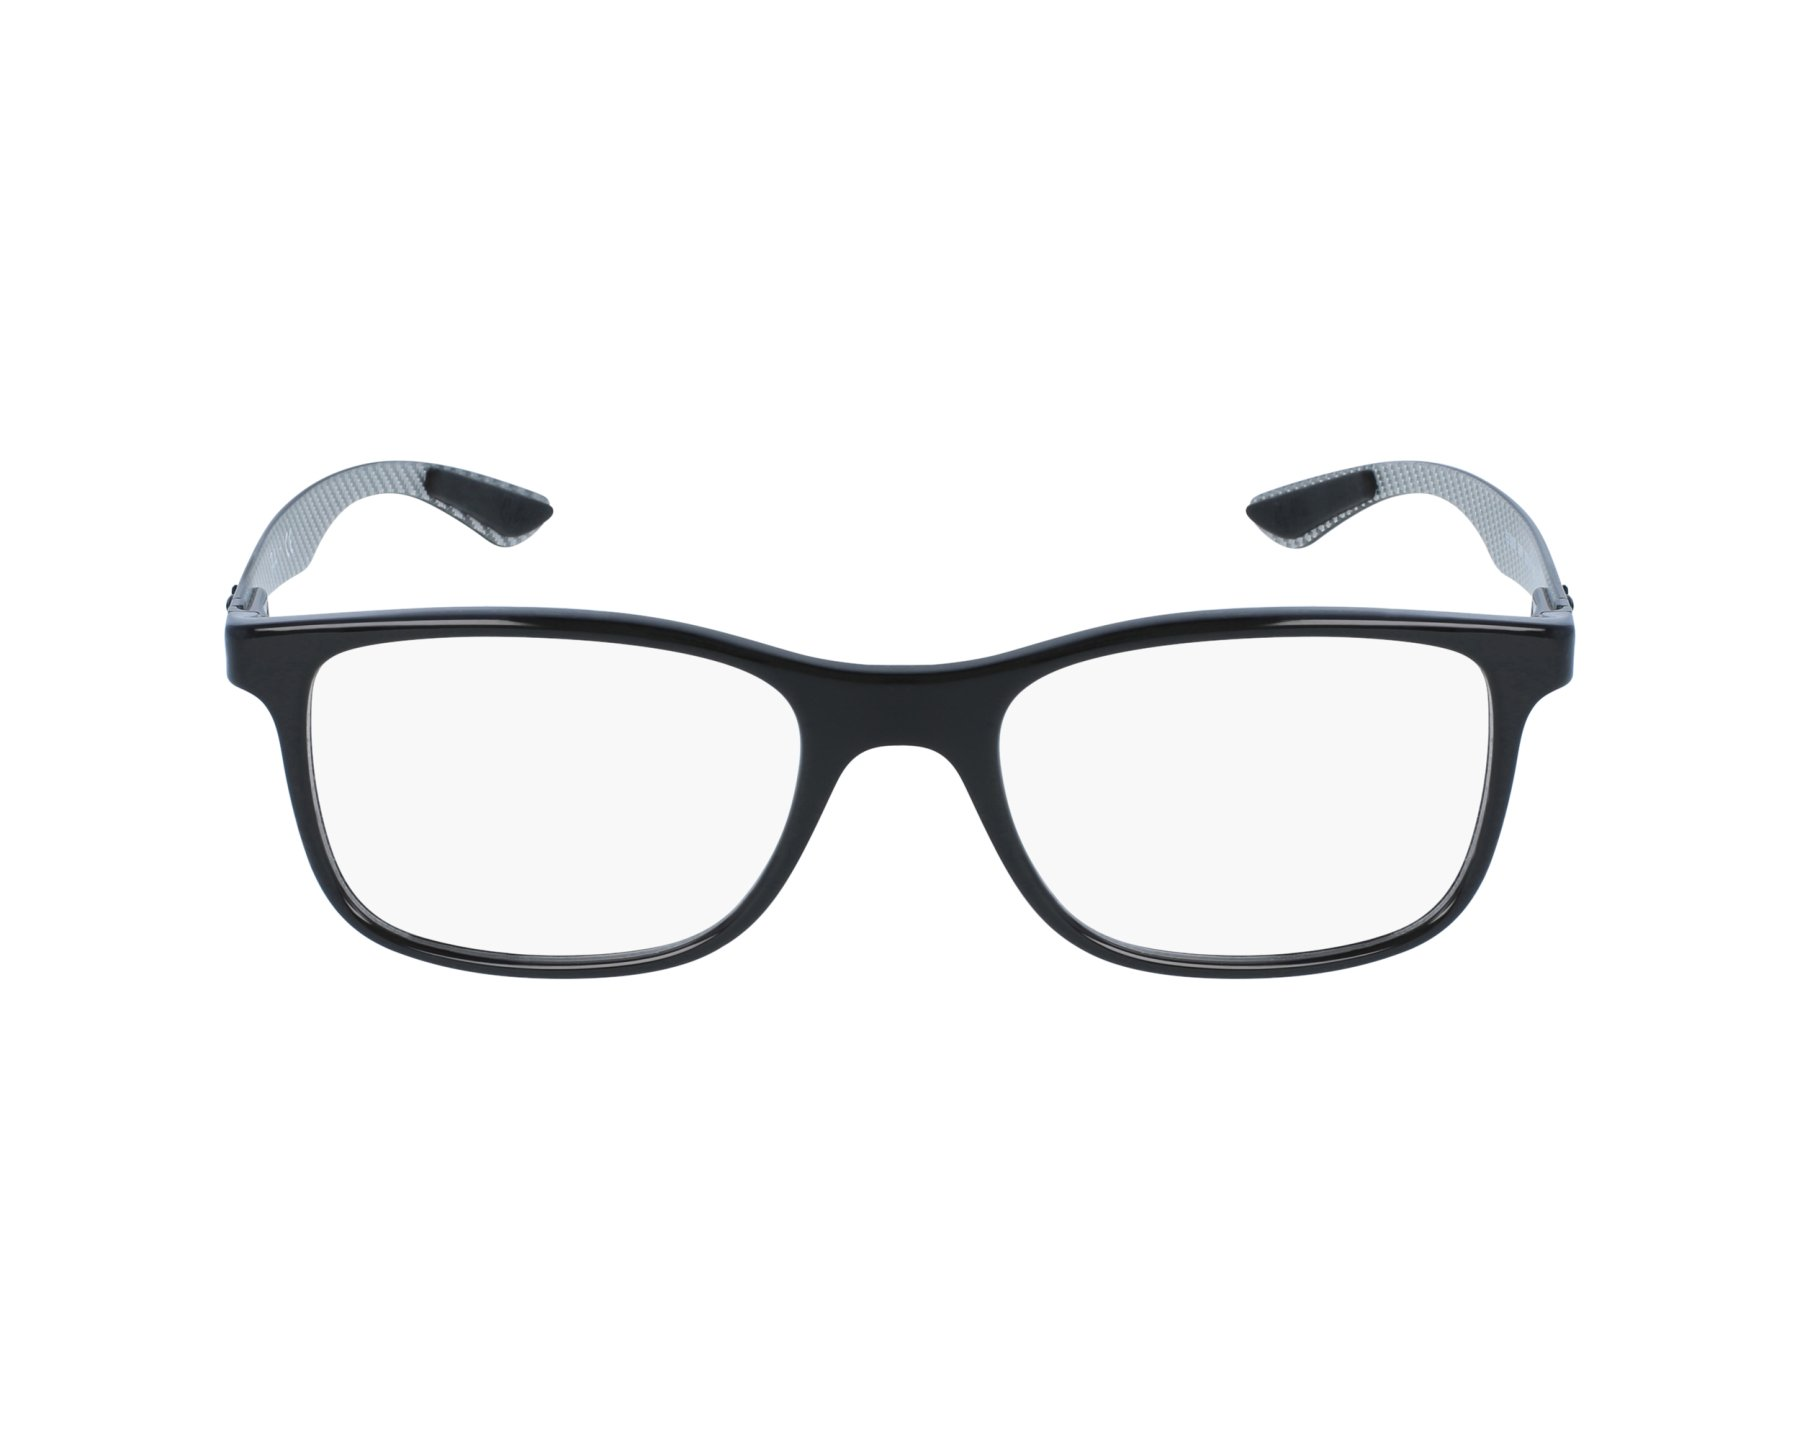 6049baf26d eyeglasses Ray-Ban RX-8903 5681 55-18 Black Carbon profile view